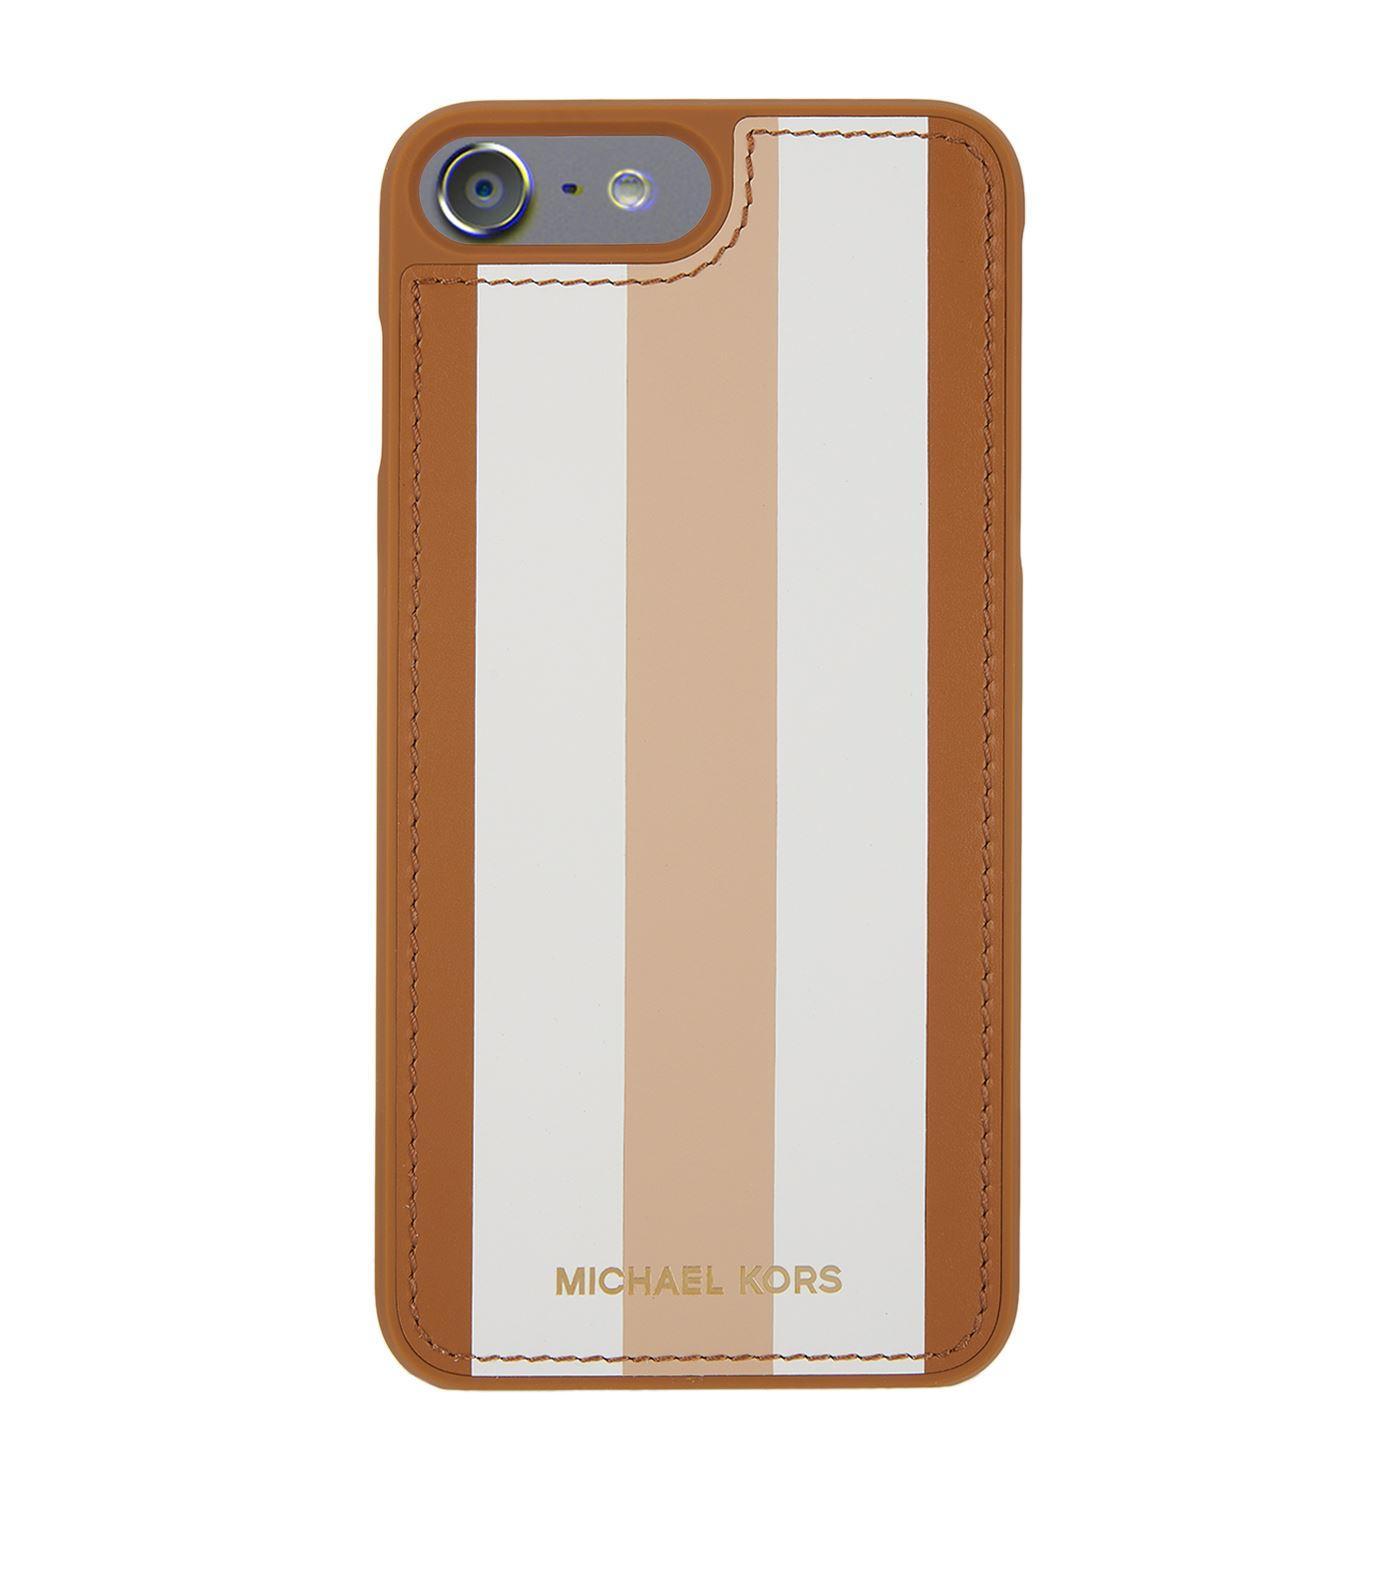 lyst michael kors leather stripe iphone 7 plus case in brown. Black Bedroom Furniture Sets. Home Design Ideas